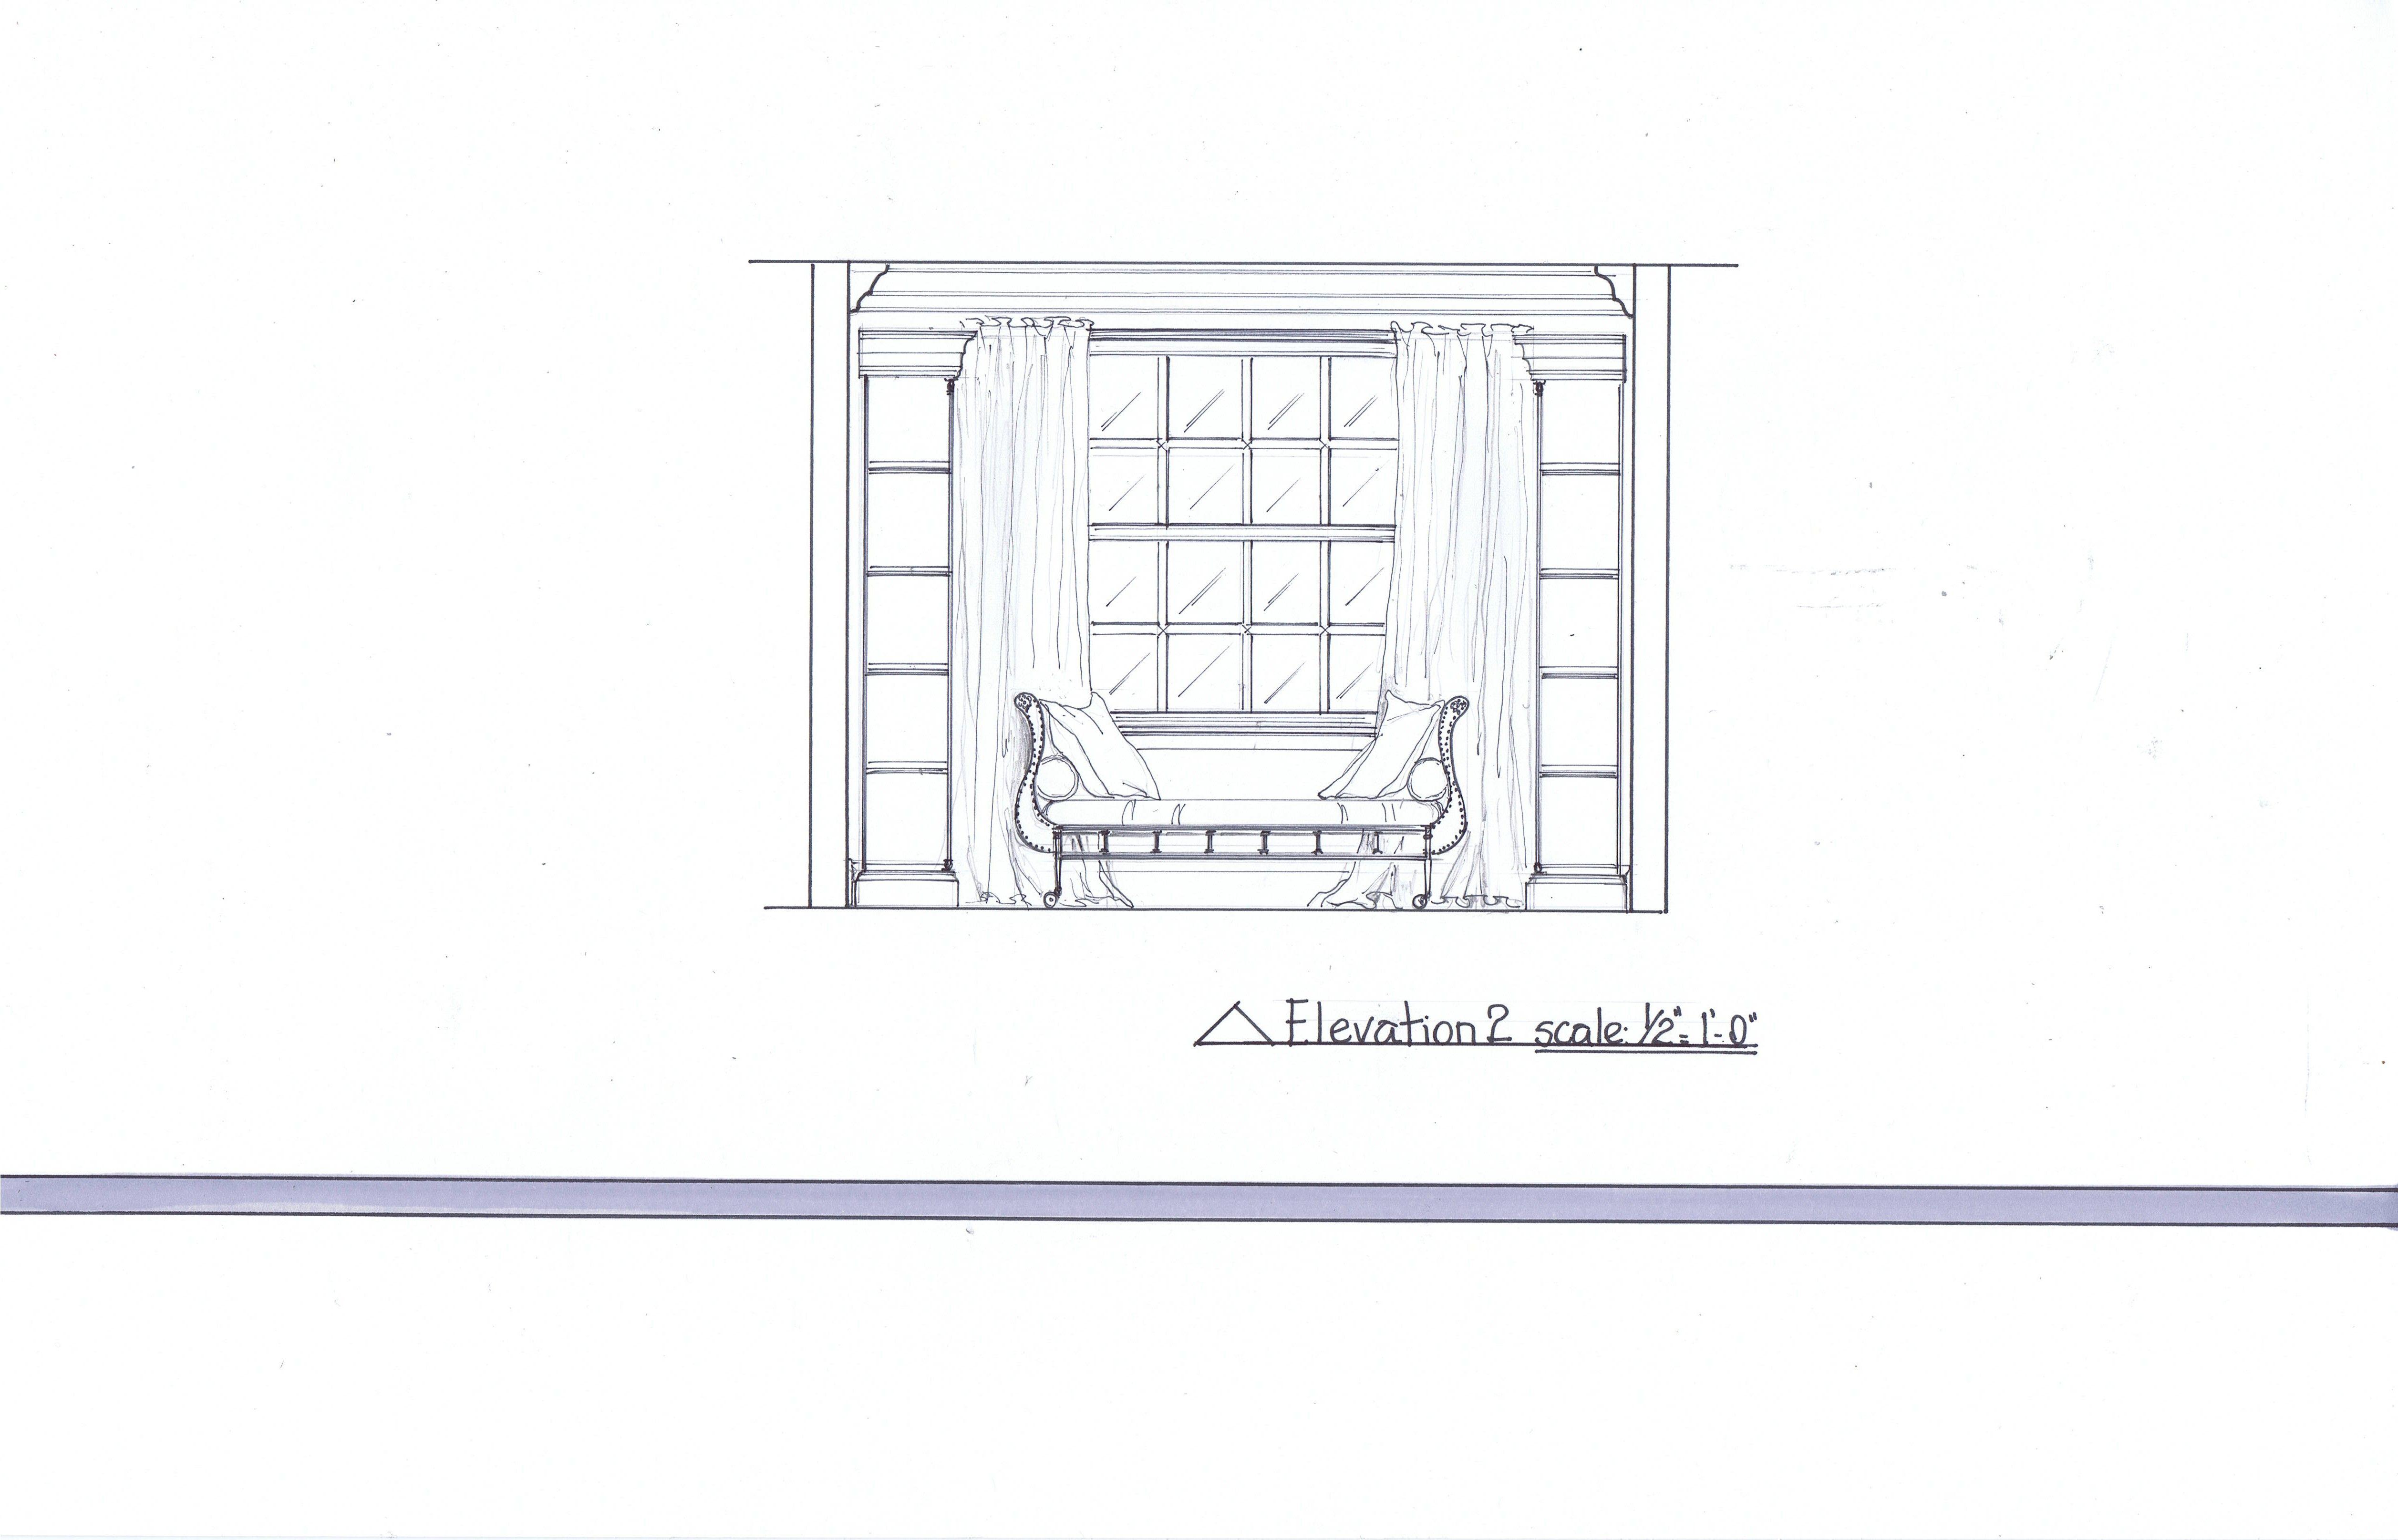 [DIAGRAM] Wiring Diagram Of A Zer Room FULL Version HD